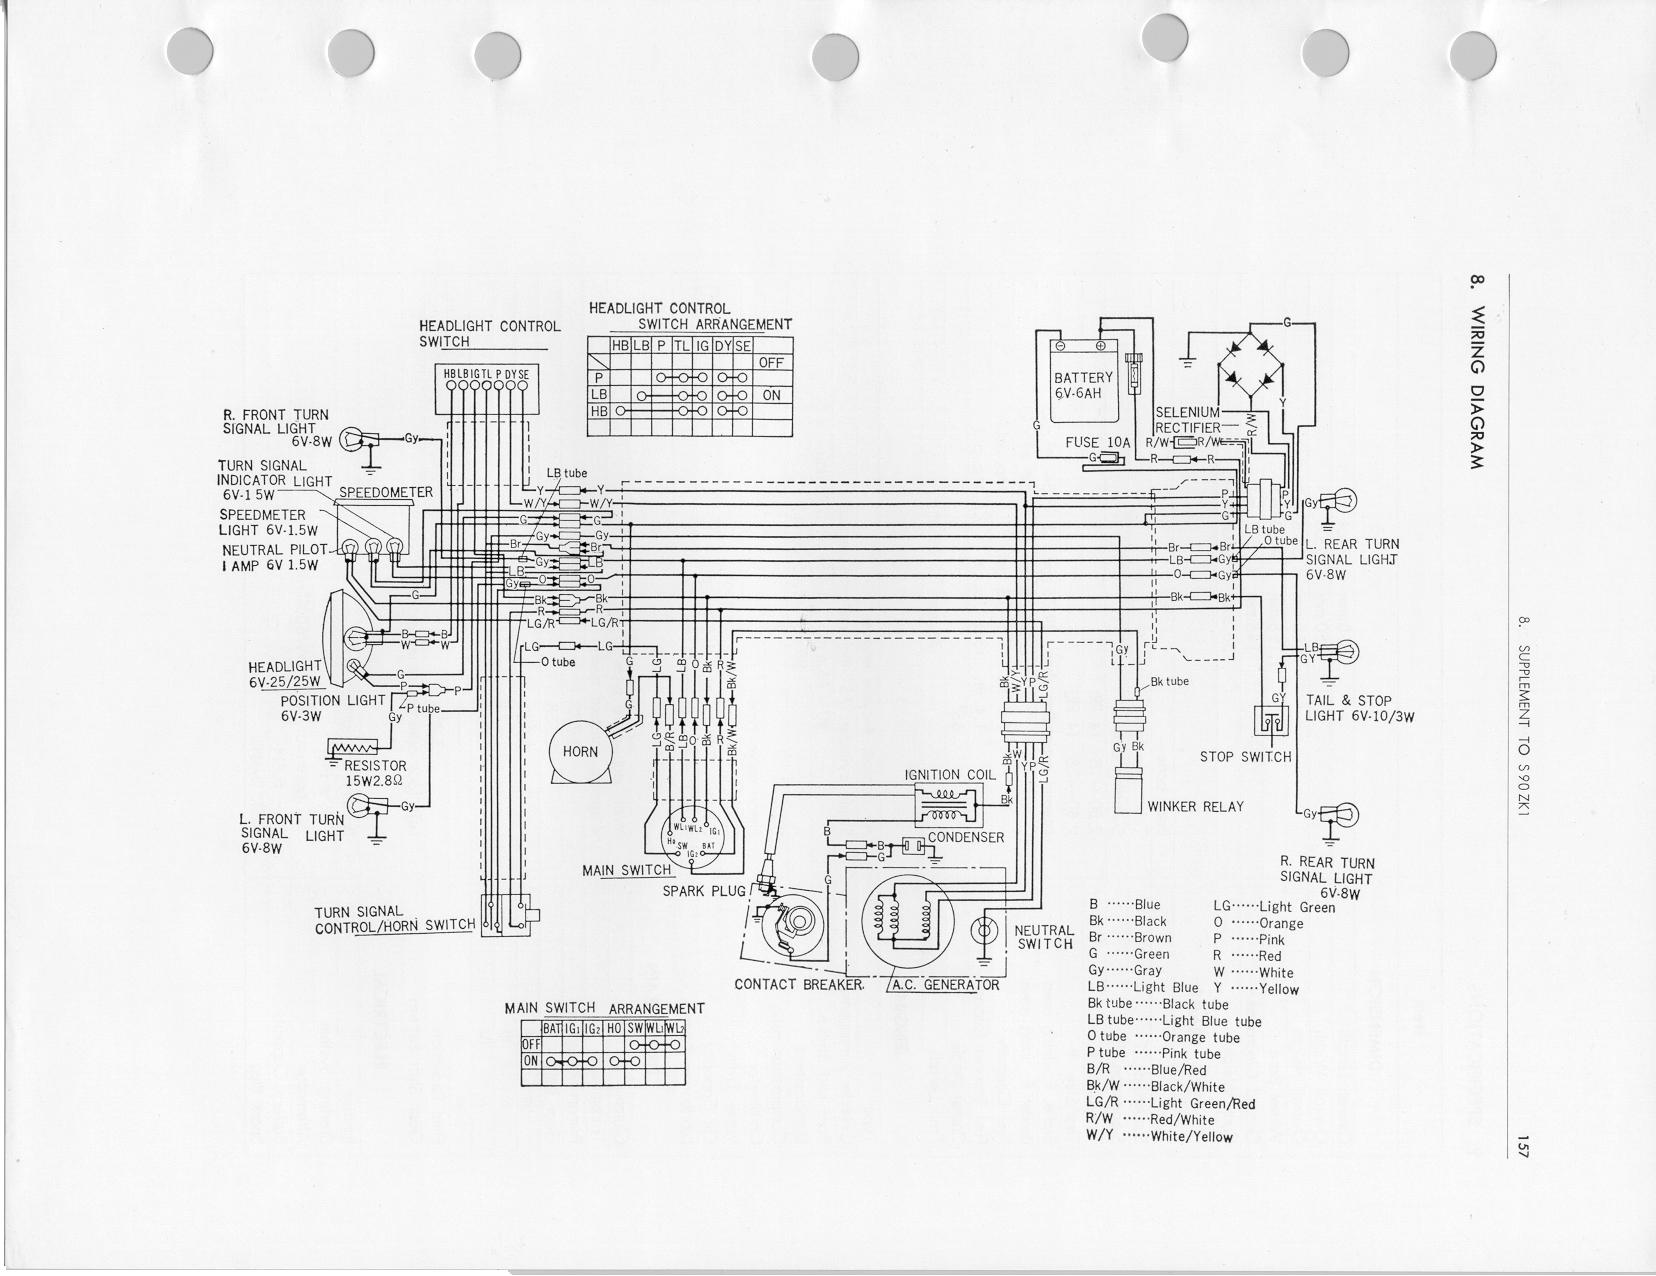 [SCHEMATICS_44OR]  OG_1971] Diagrama Honda C90 Wiring Diagram | Honda C90 Wiring Diagram |  | Exxlu Icism Mecad Astic Ratag Ginou Gue45 Mohammedshrine Librar Wiring 101